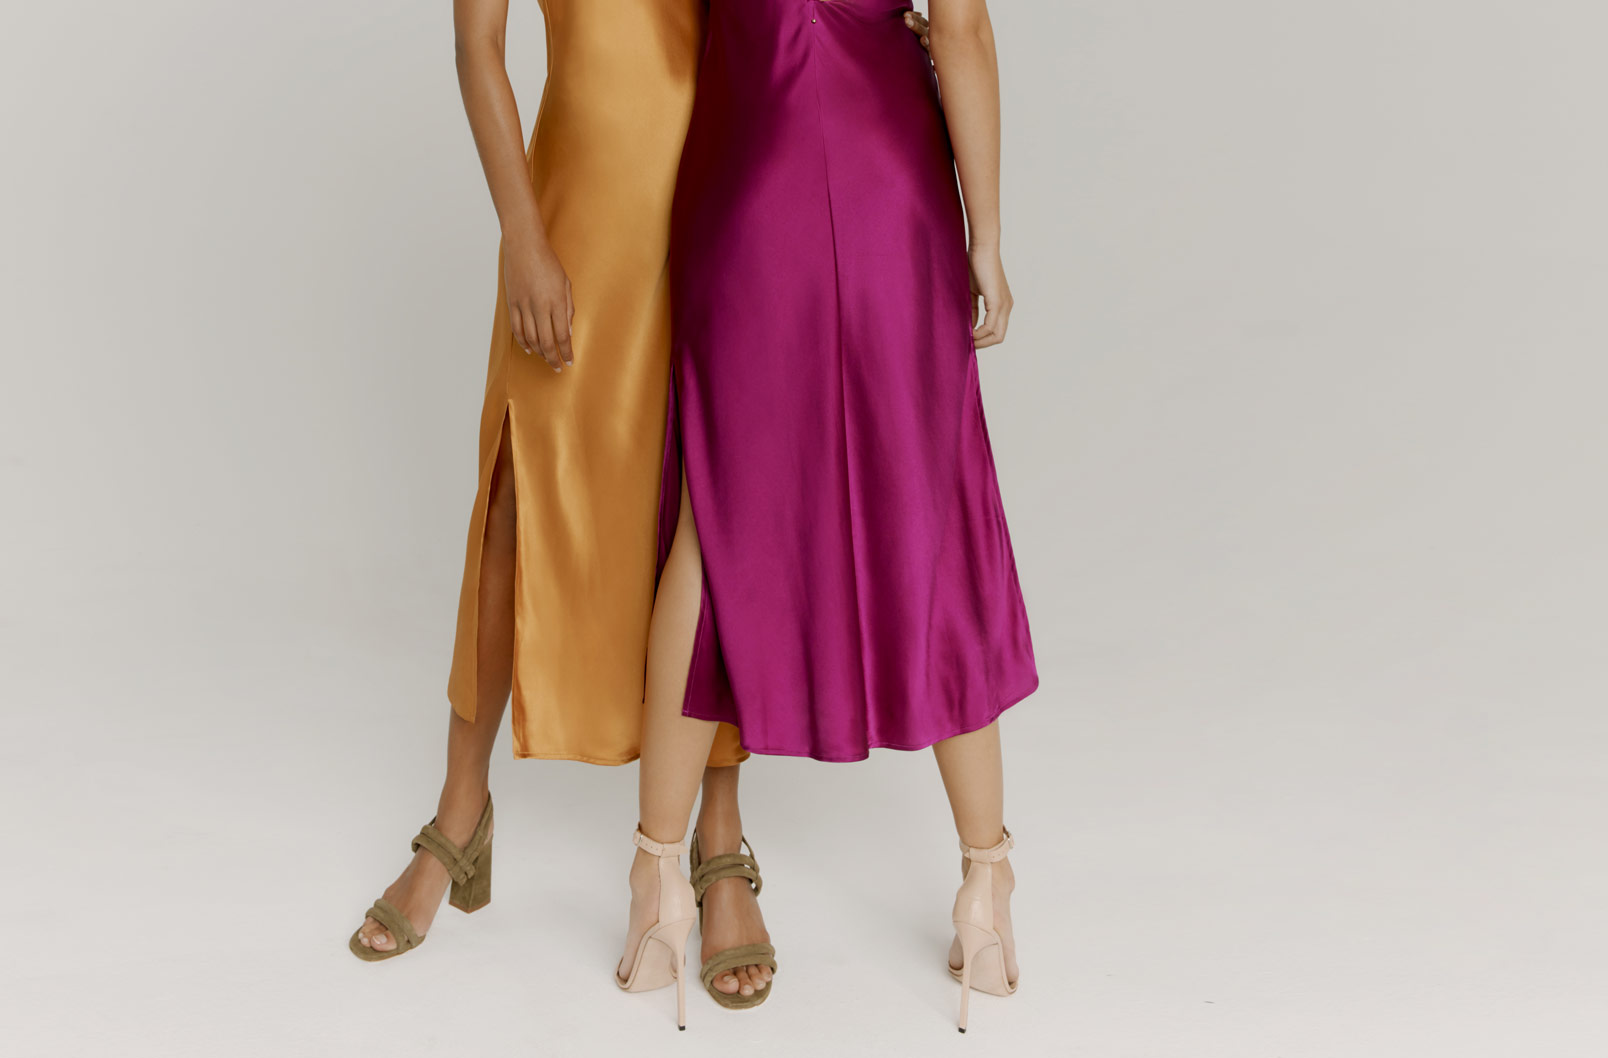 Two models showing bottom of Charmeuse Slip Dress